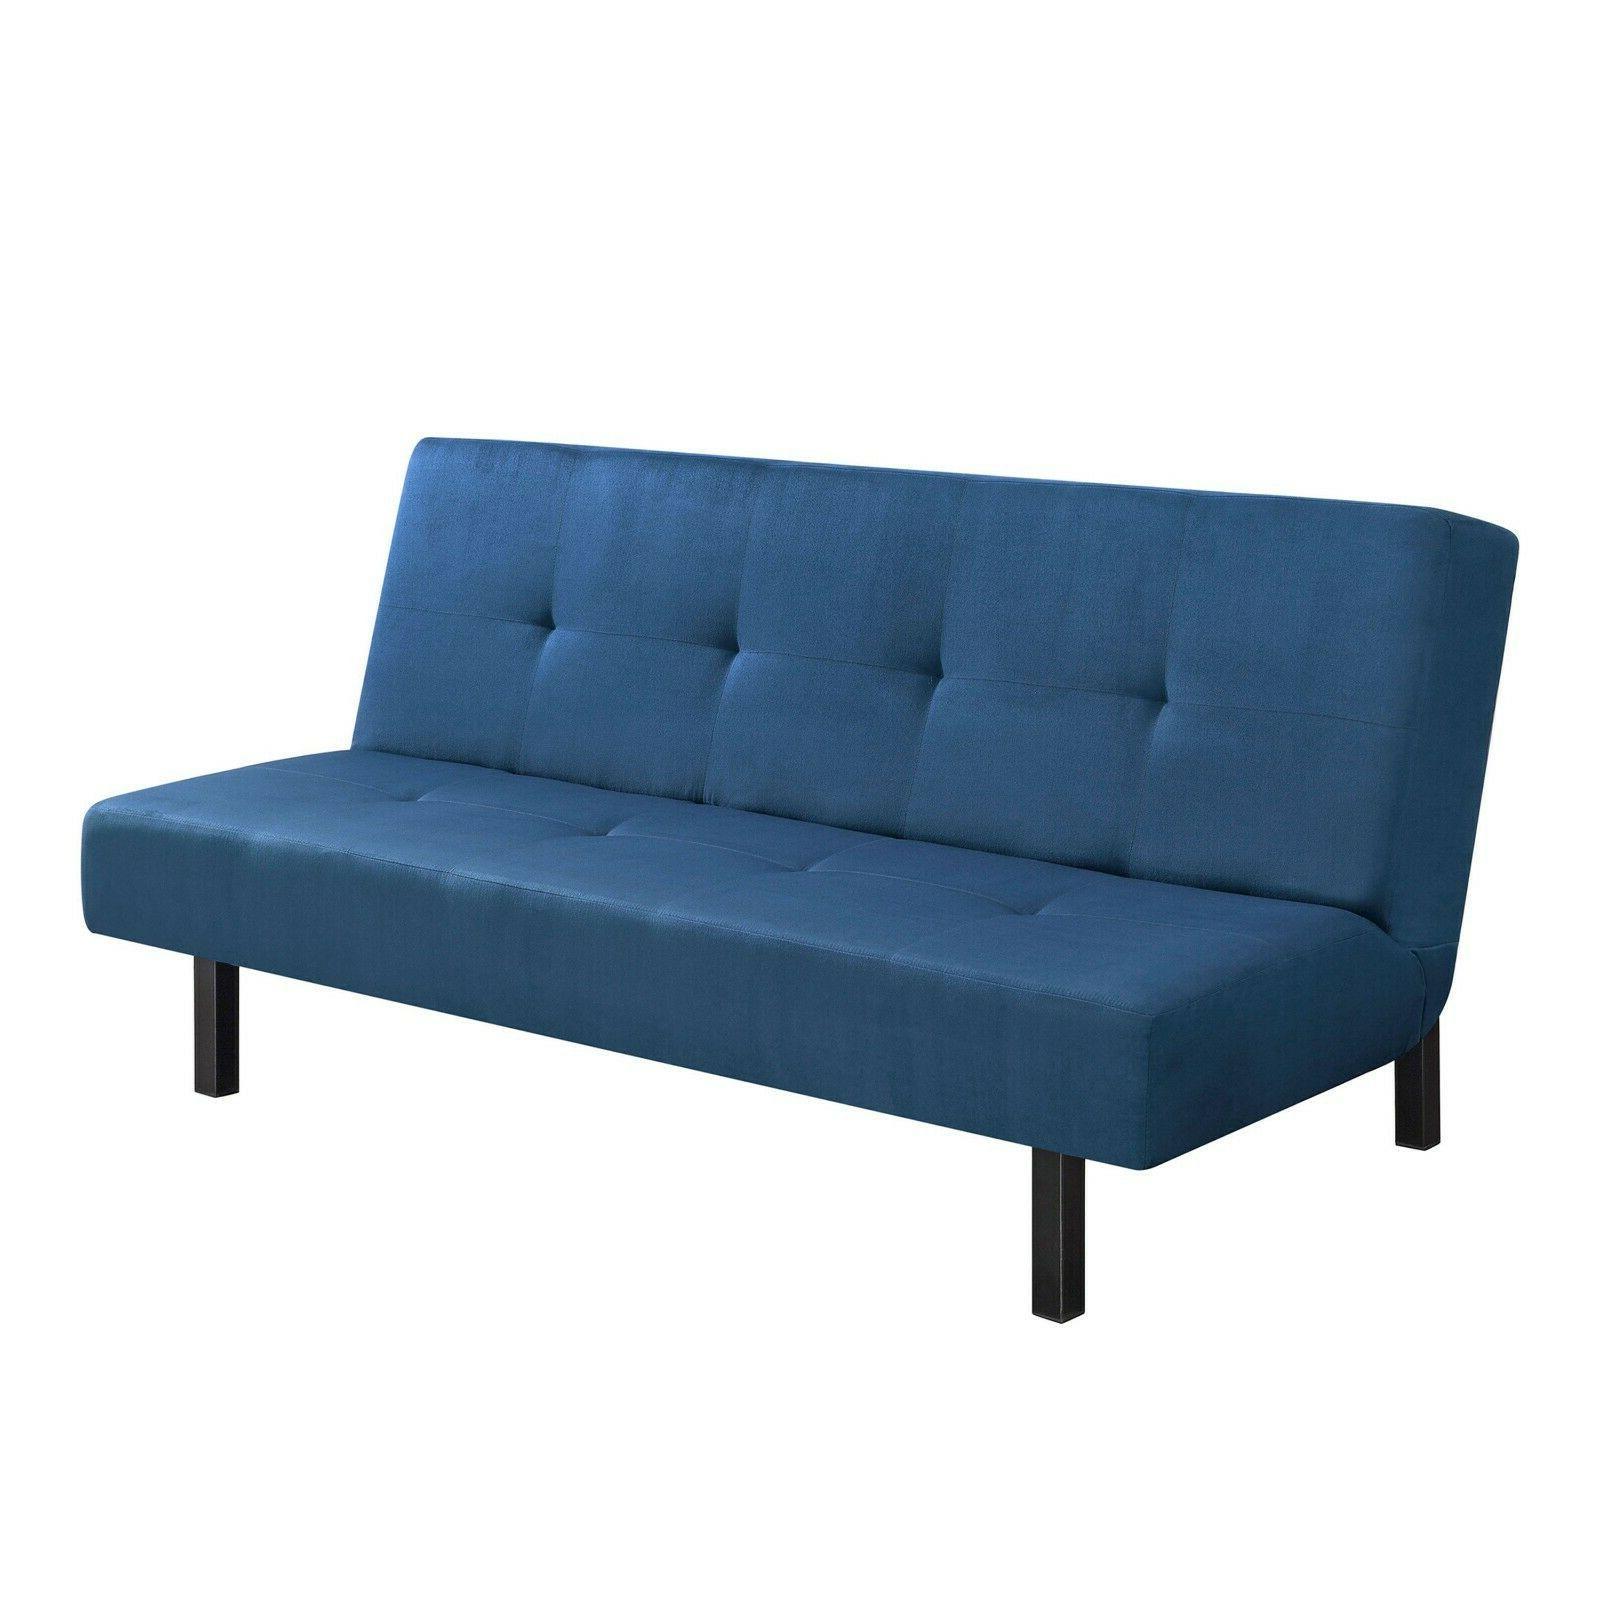 Futon Sofa Convertible Twin With